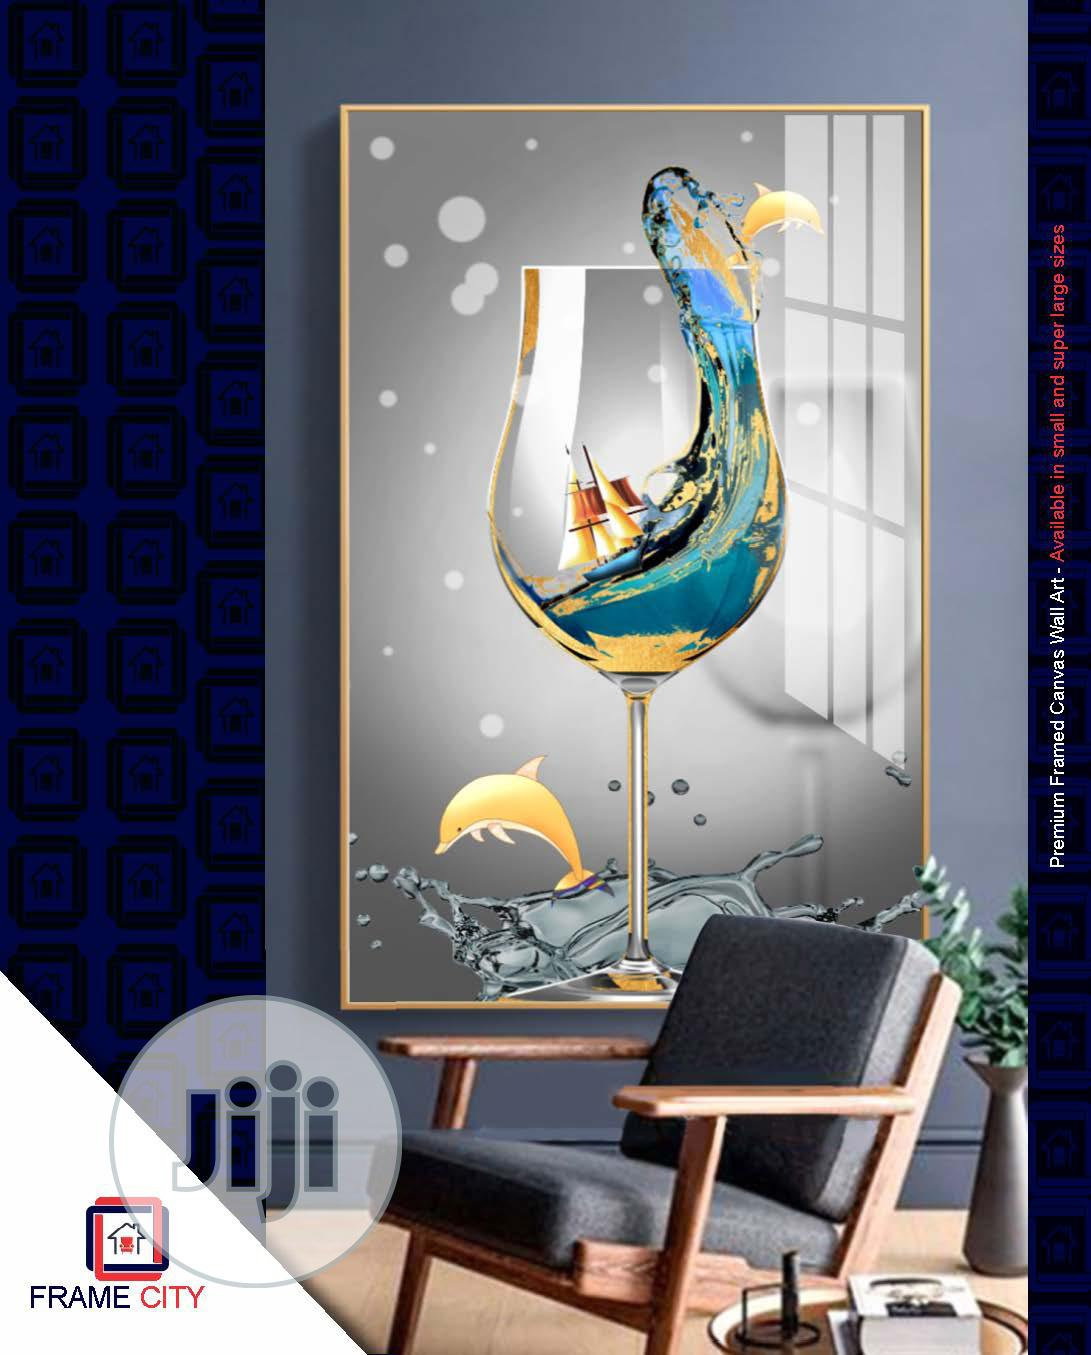 Premium Framed Digital Canvas Artwork.